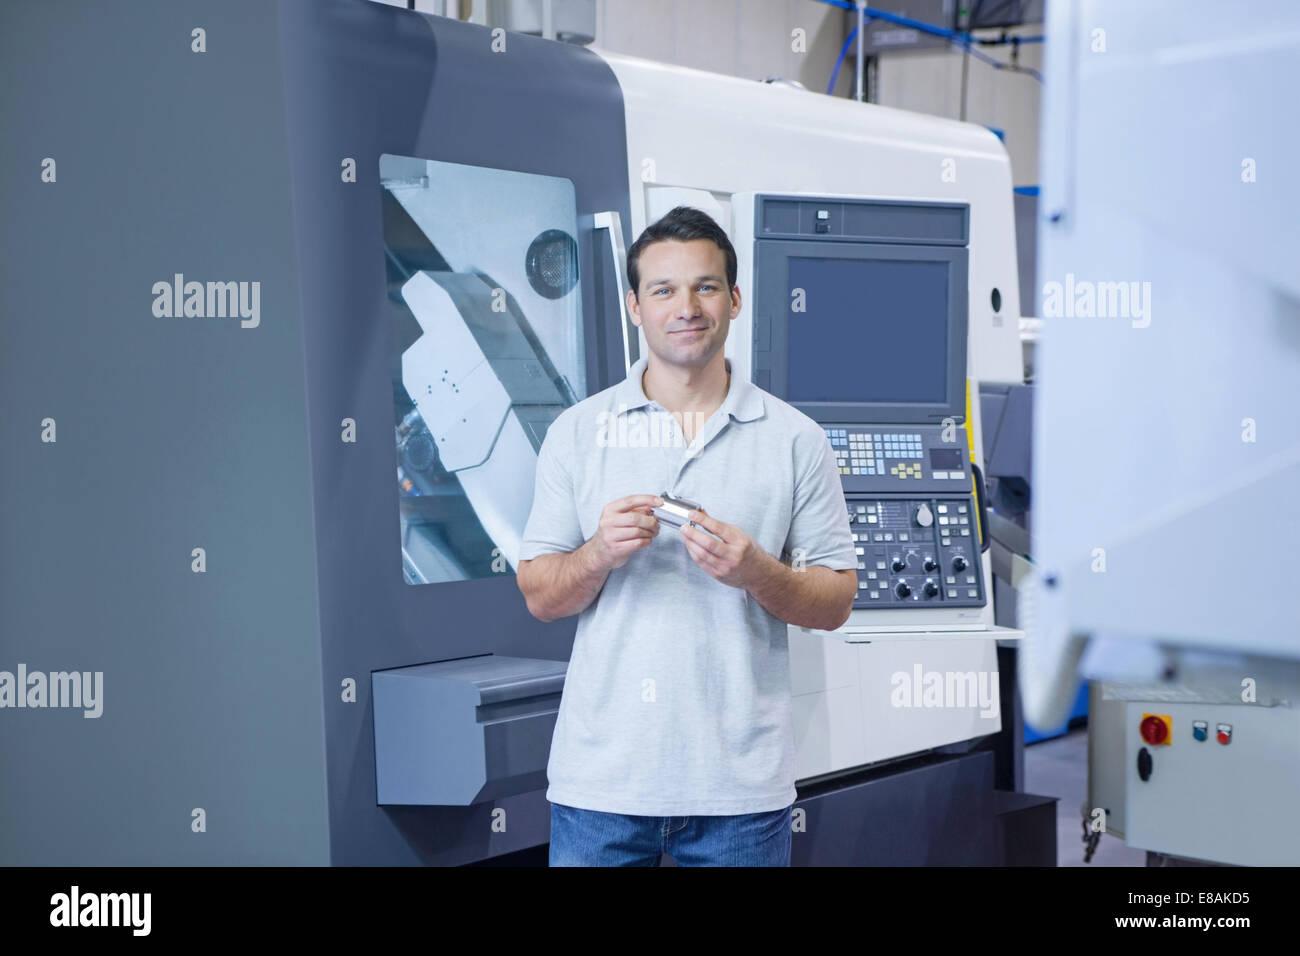 Ingegnere in CNC ingegneria di precisione Immagini Stock